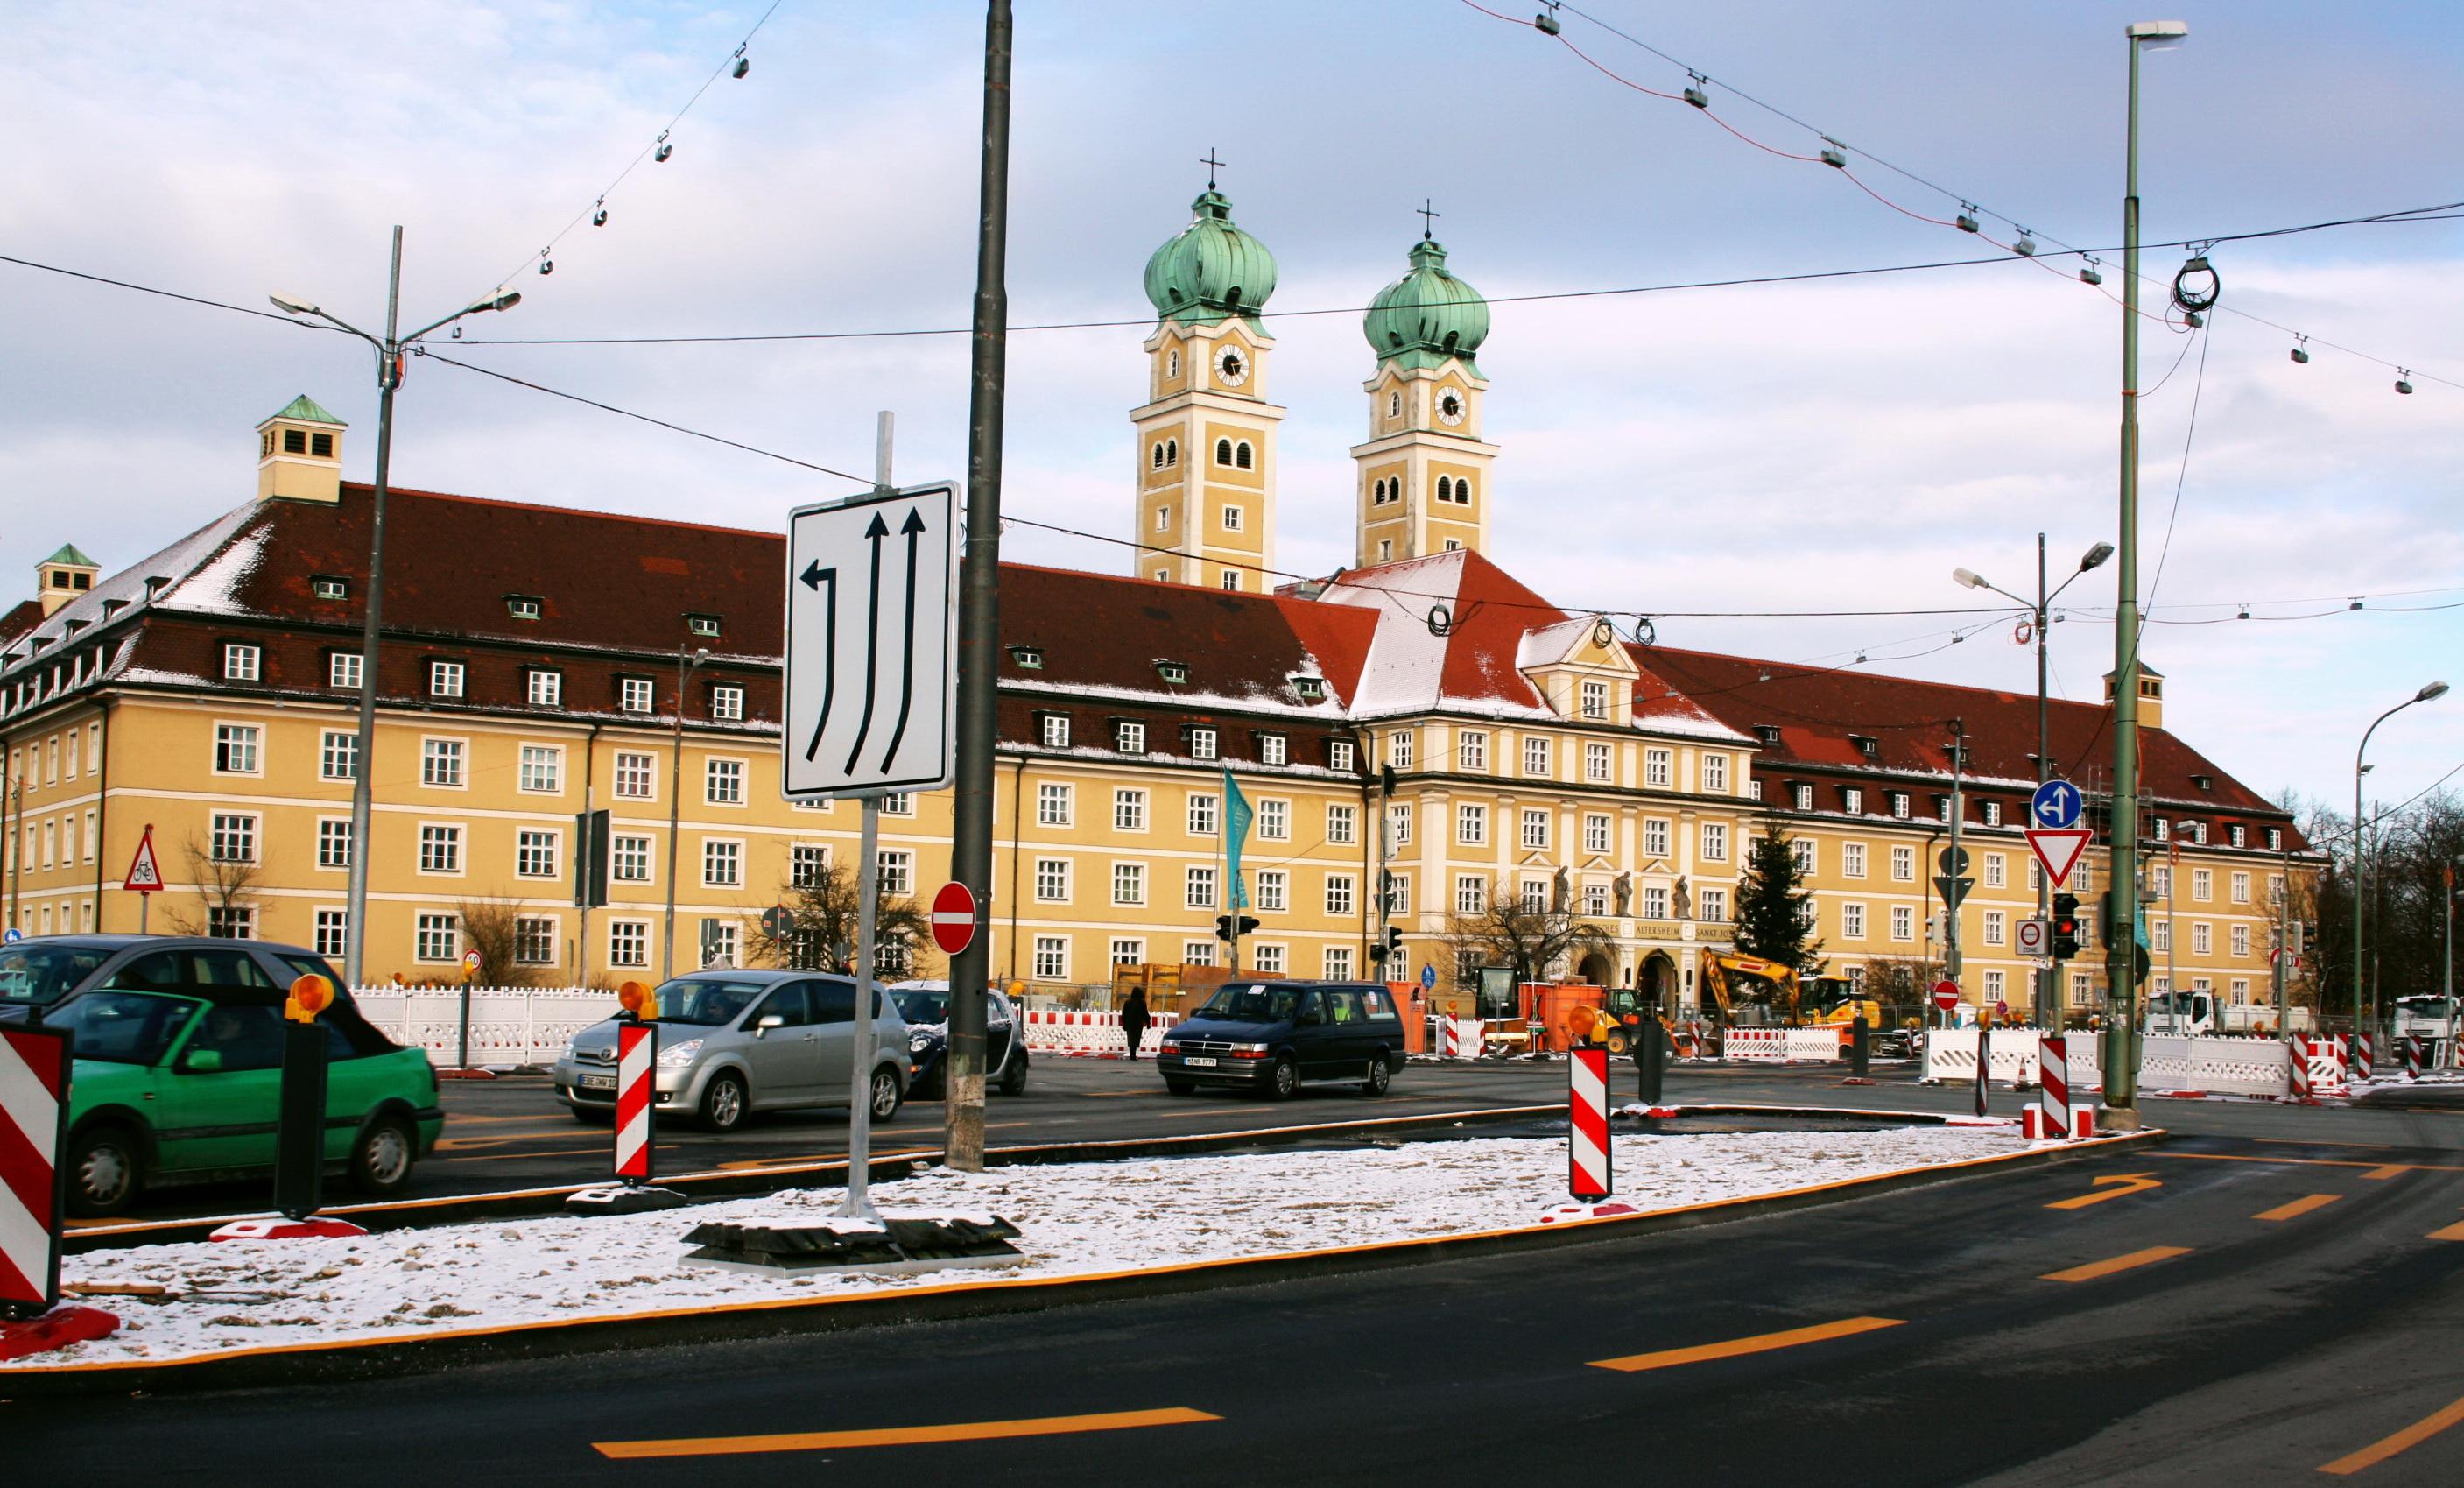 St Platz München file altenheim st josef am luise kiesselbach platz